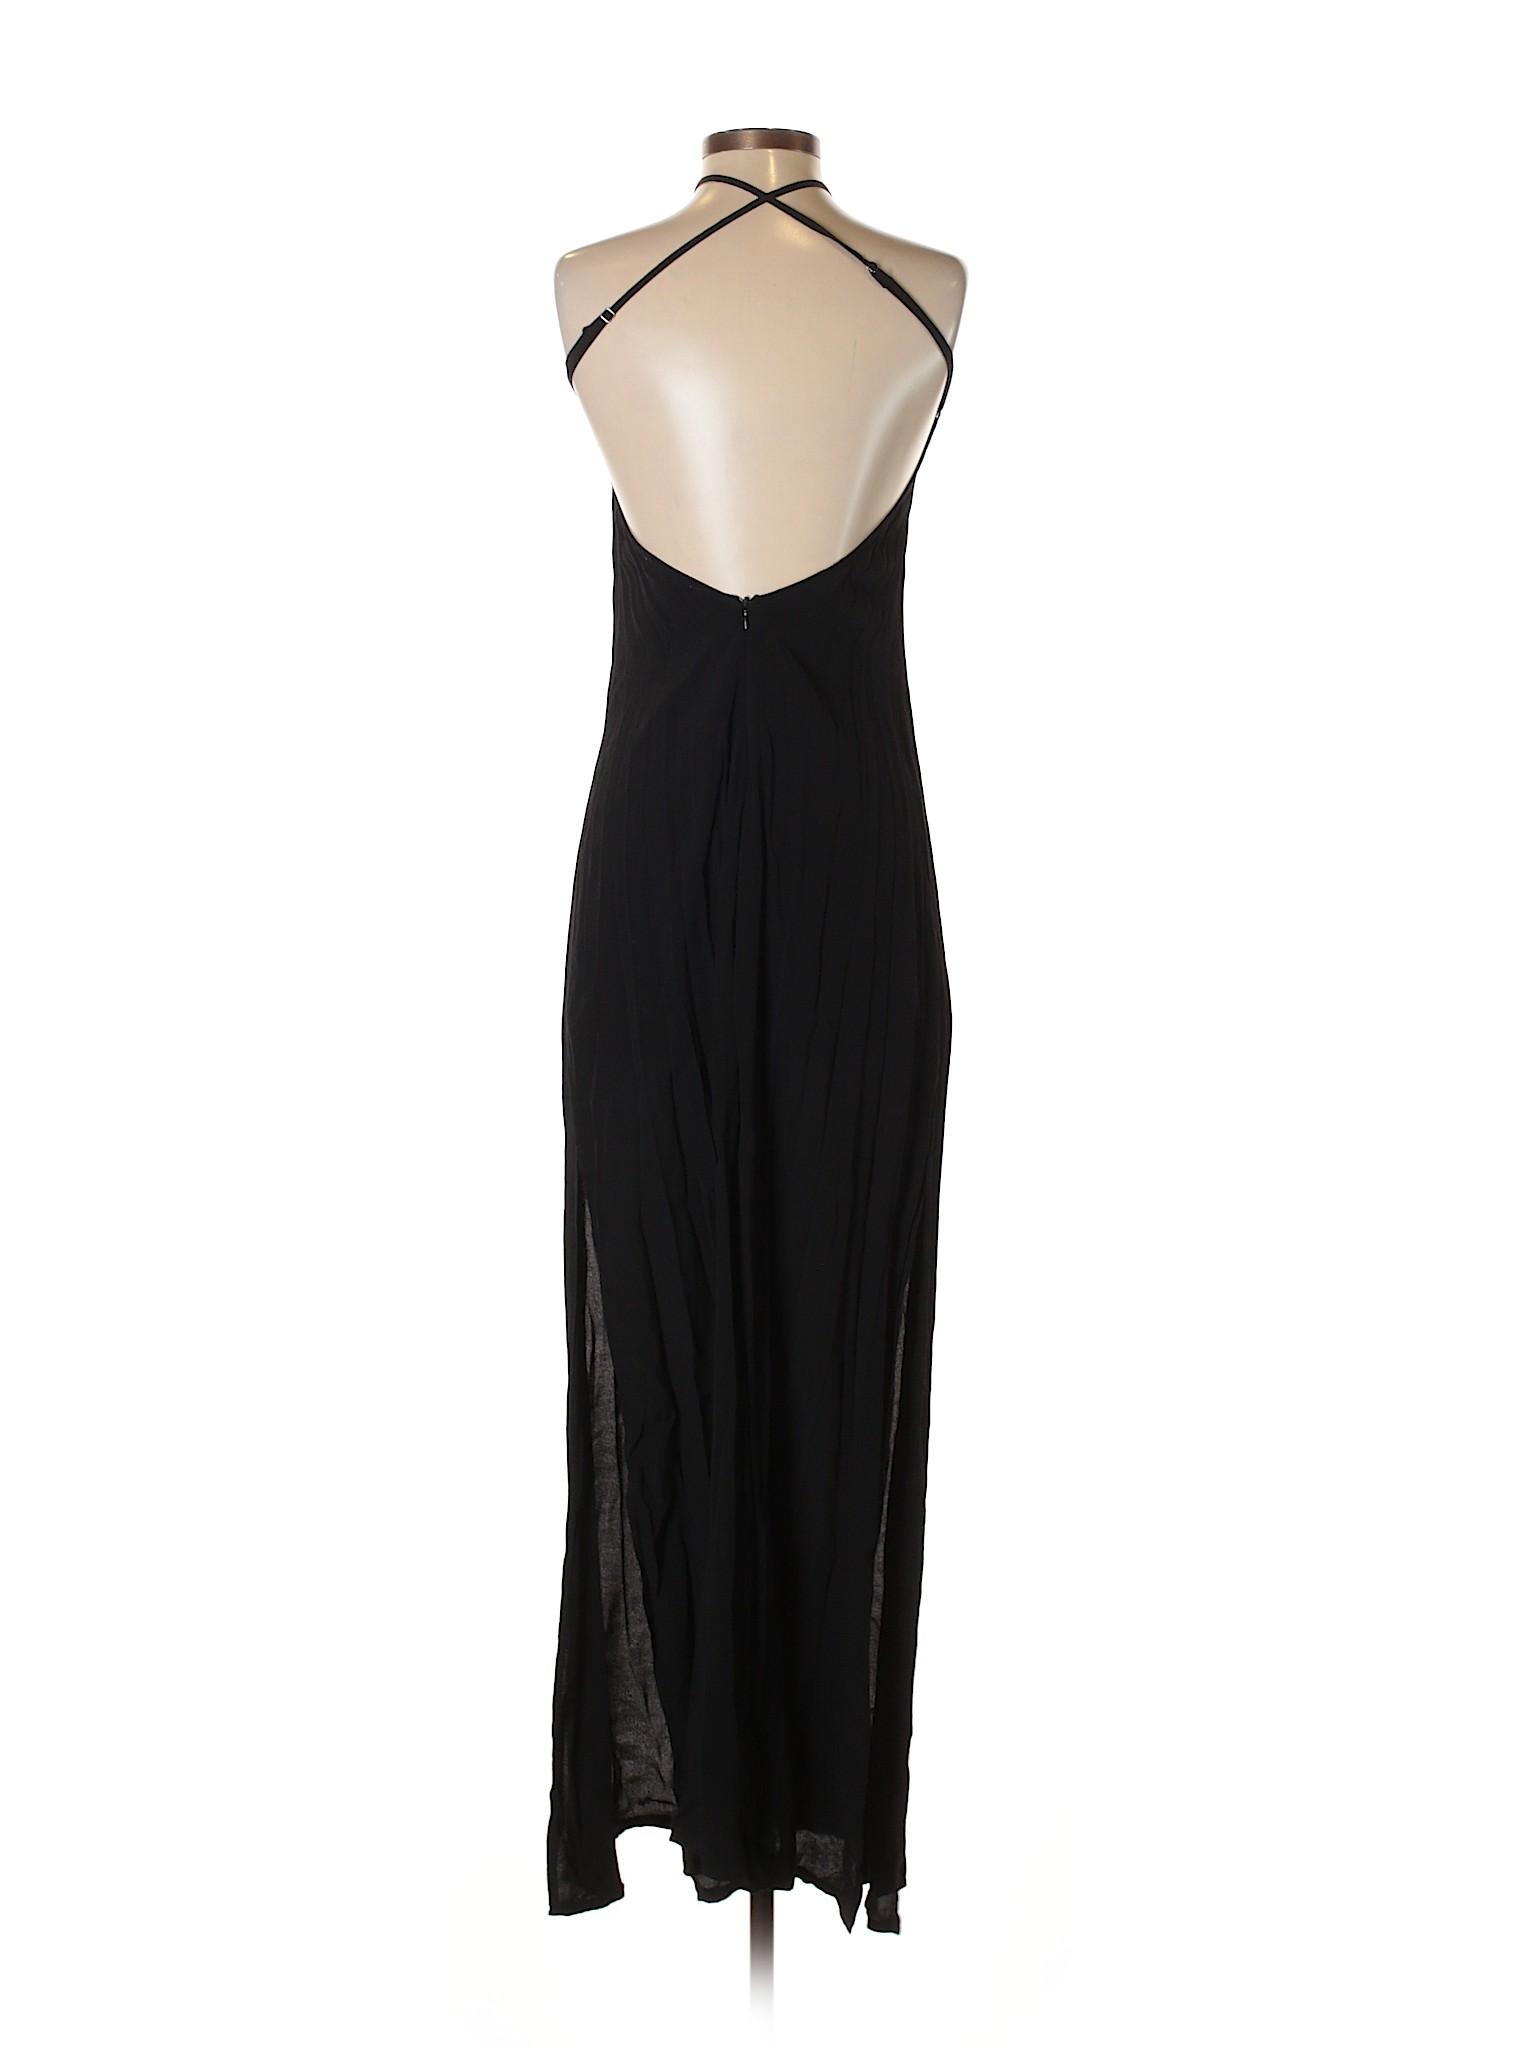 Glamorous Selling Dress Selling Glamorous Casual E7wPqvO